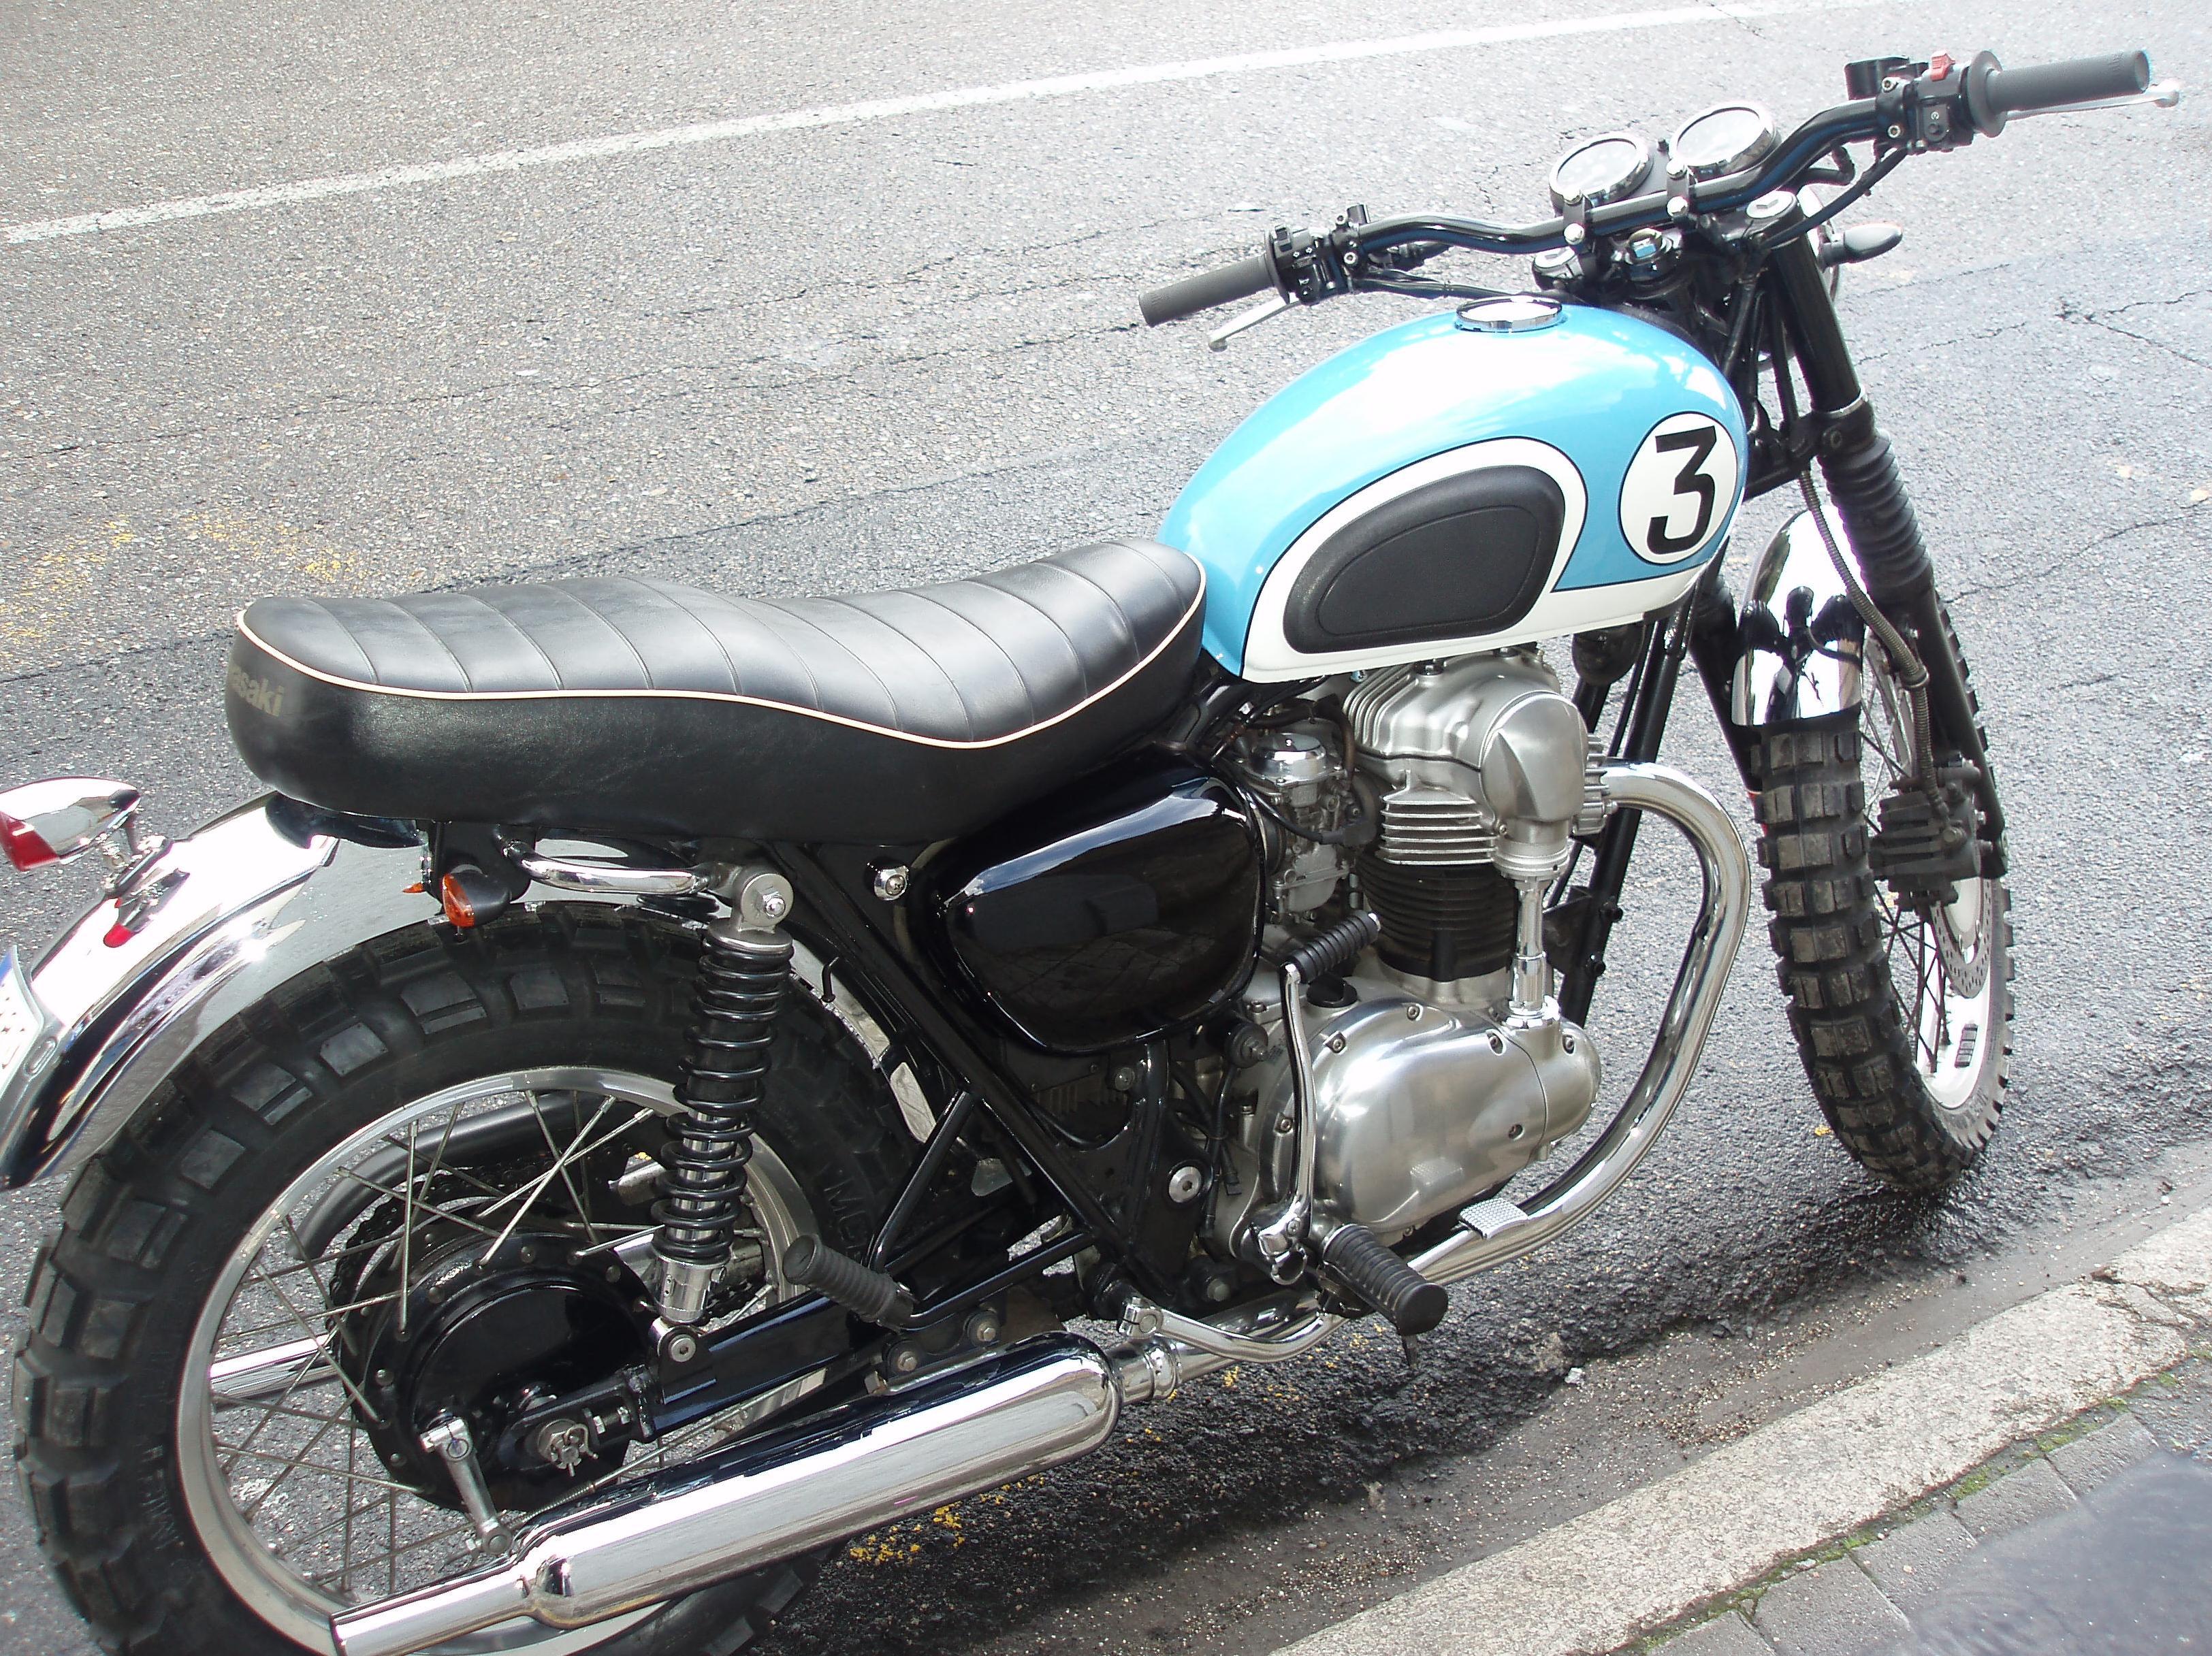 Foto 27 de Motos en Vigo | Moto 2